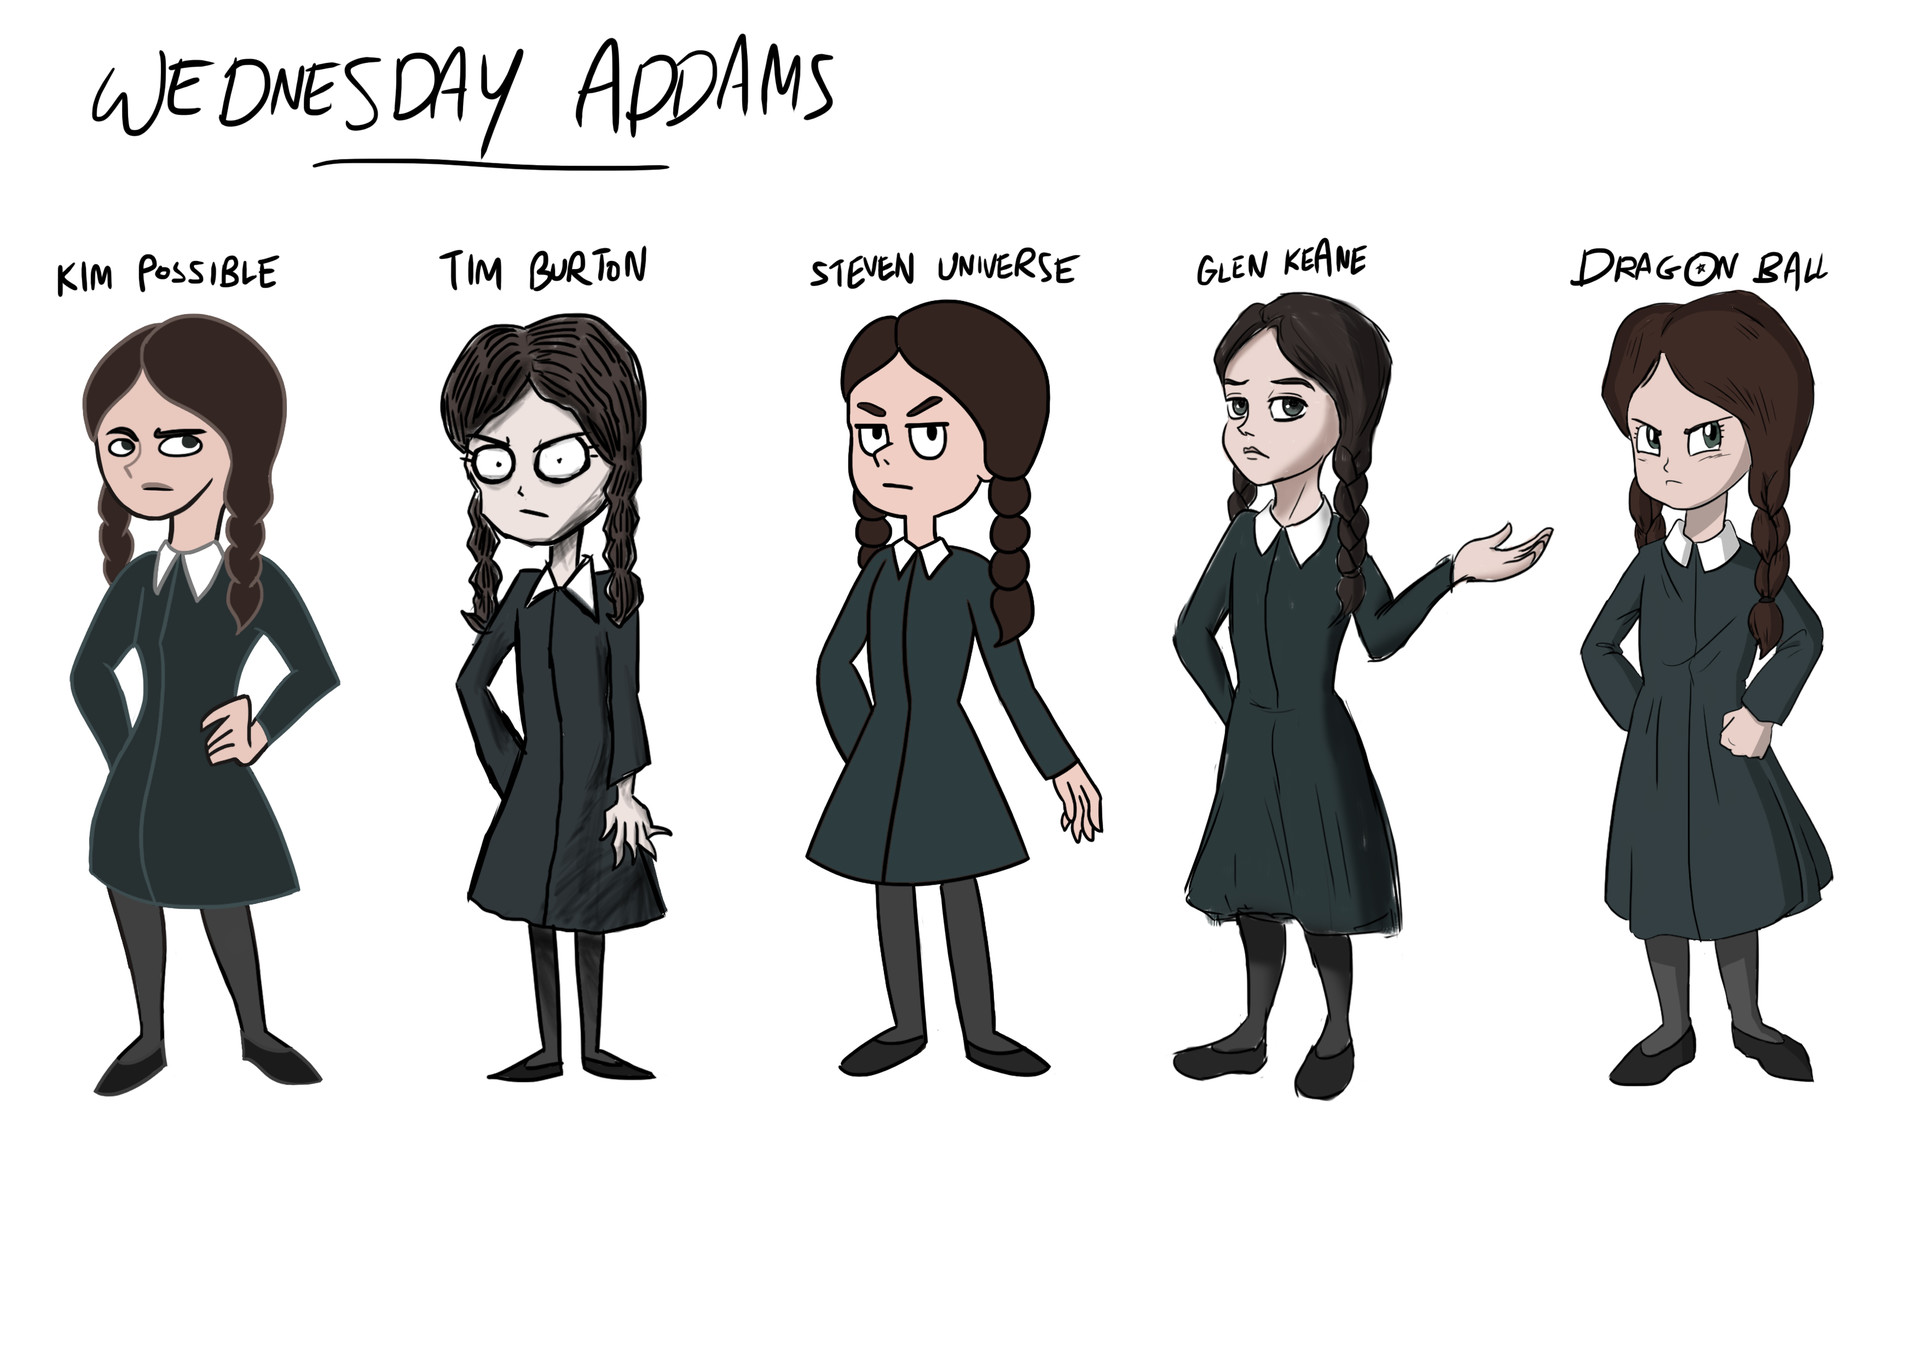 ArtStation - Style Challenge - Wednesday Addams, Zack Chua